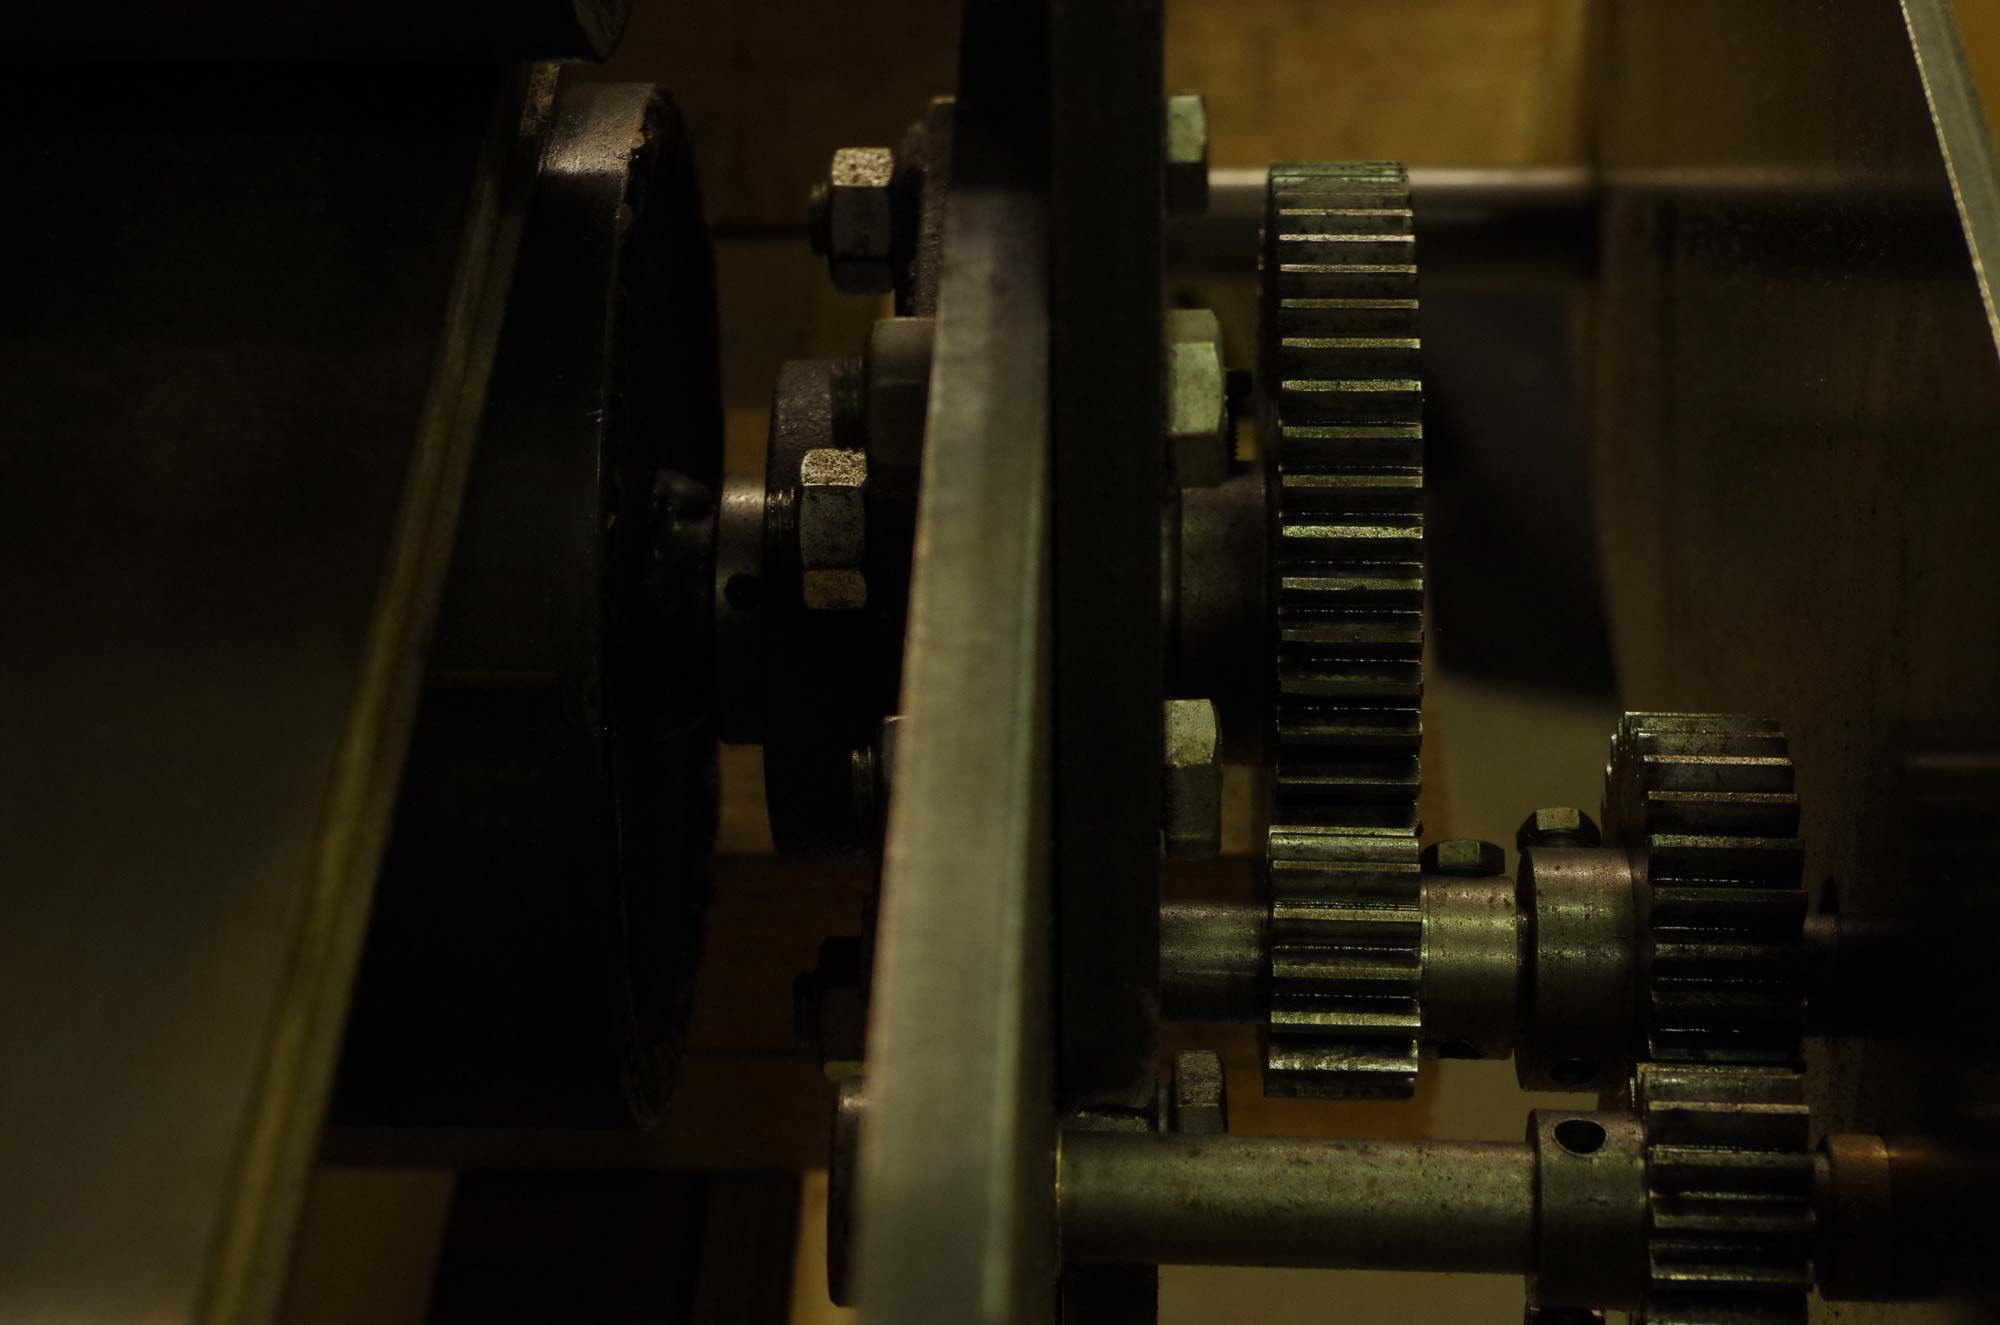 Gears #handmade #etchingpress #etchingstudio #art #peckham